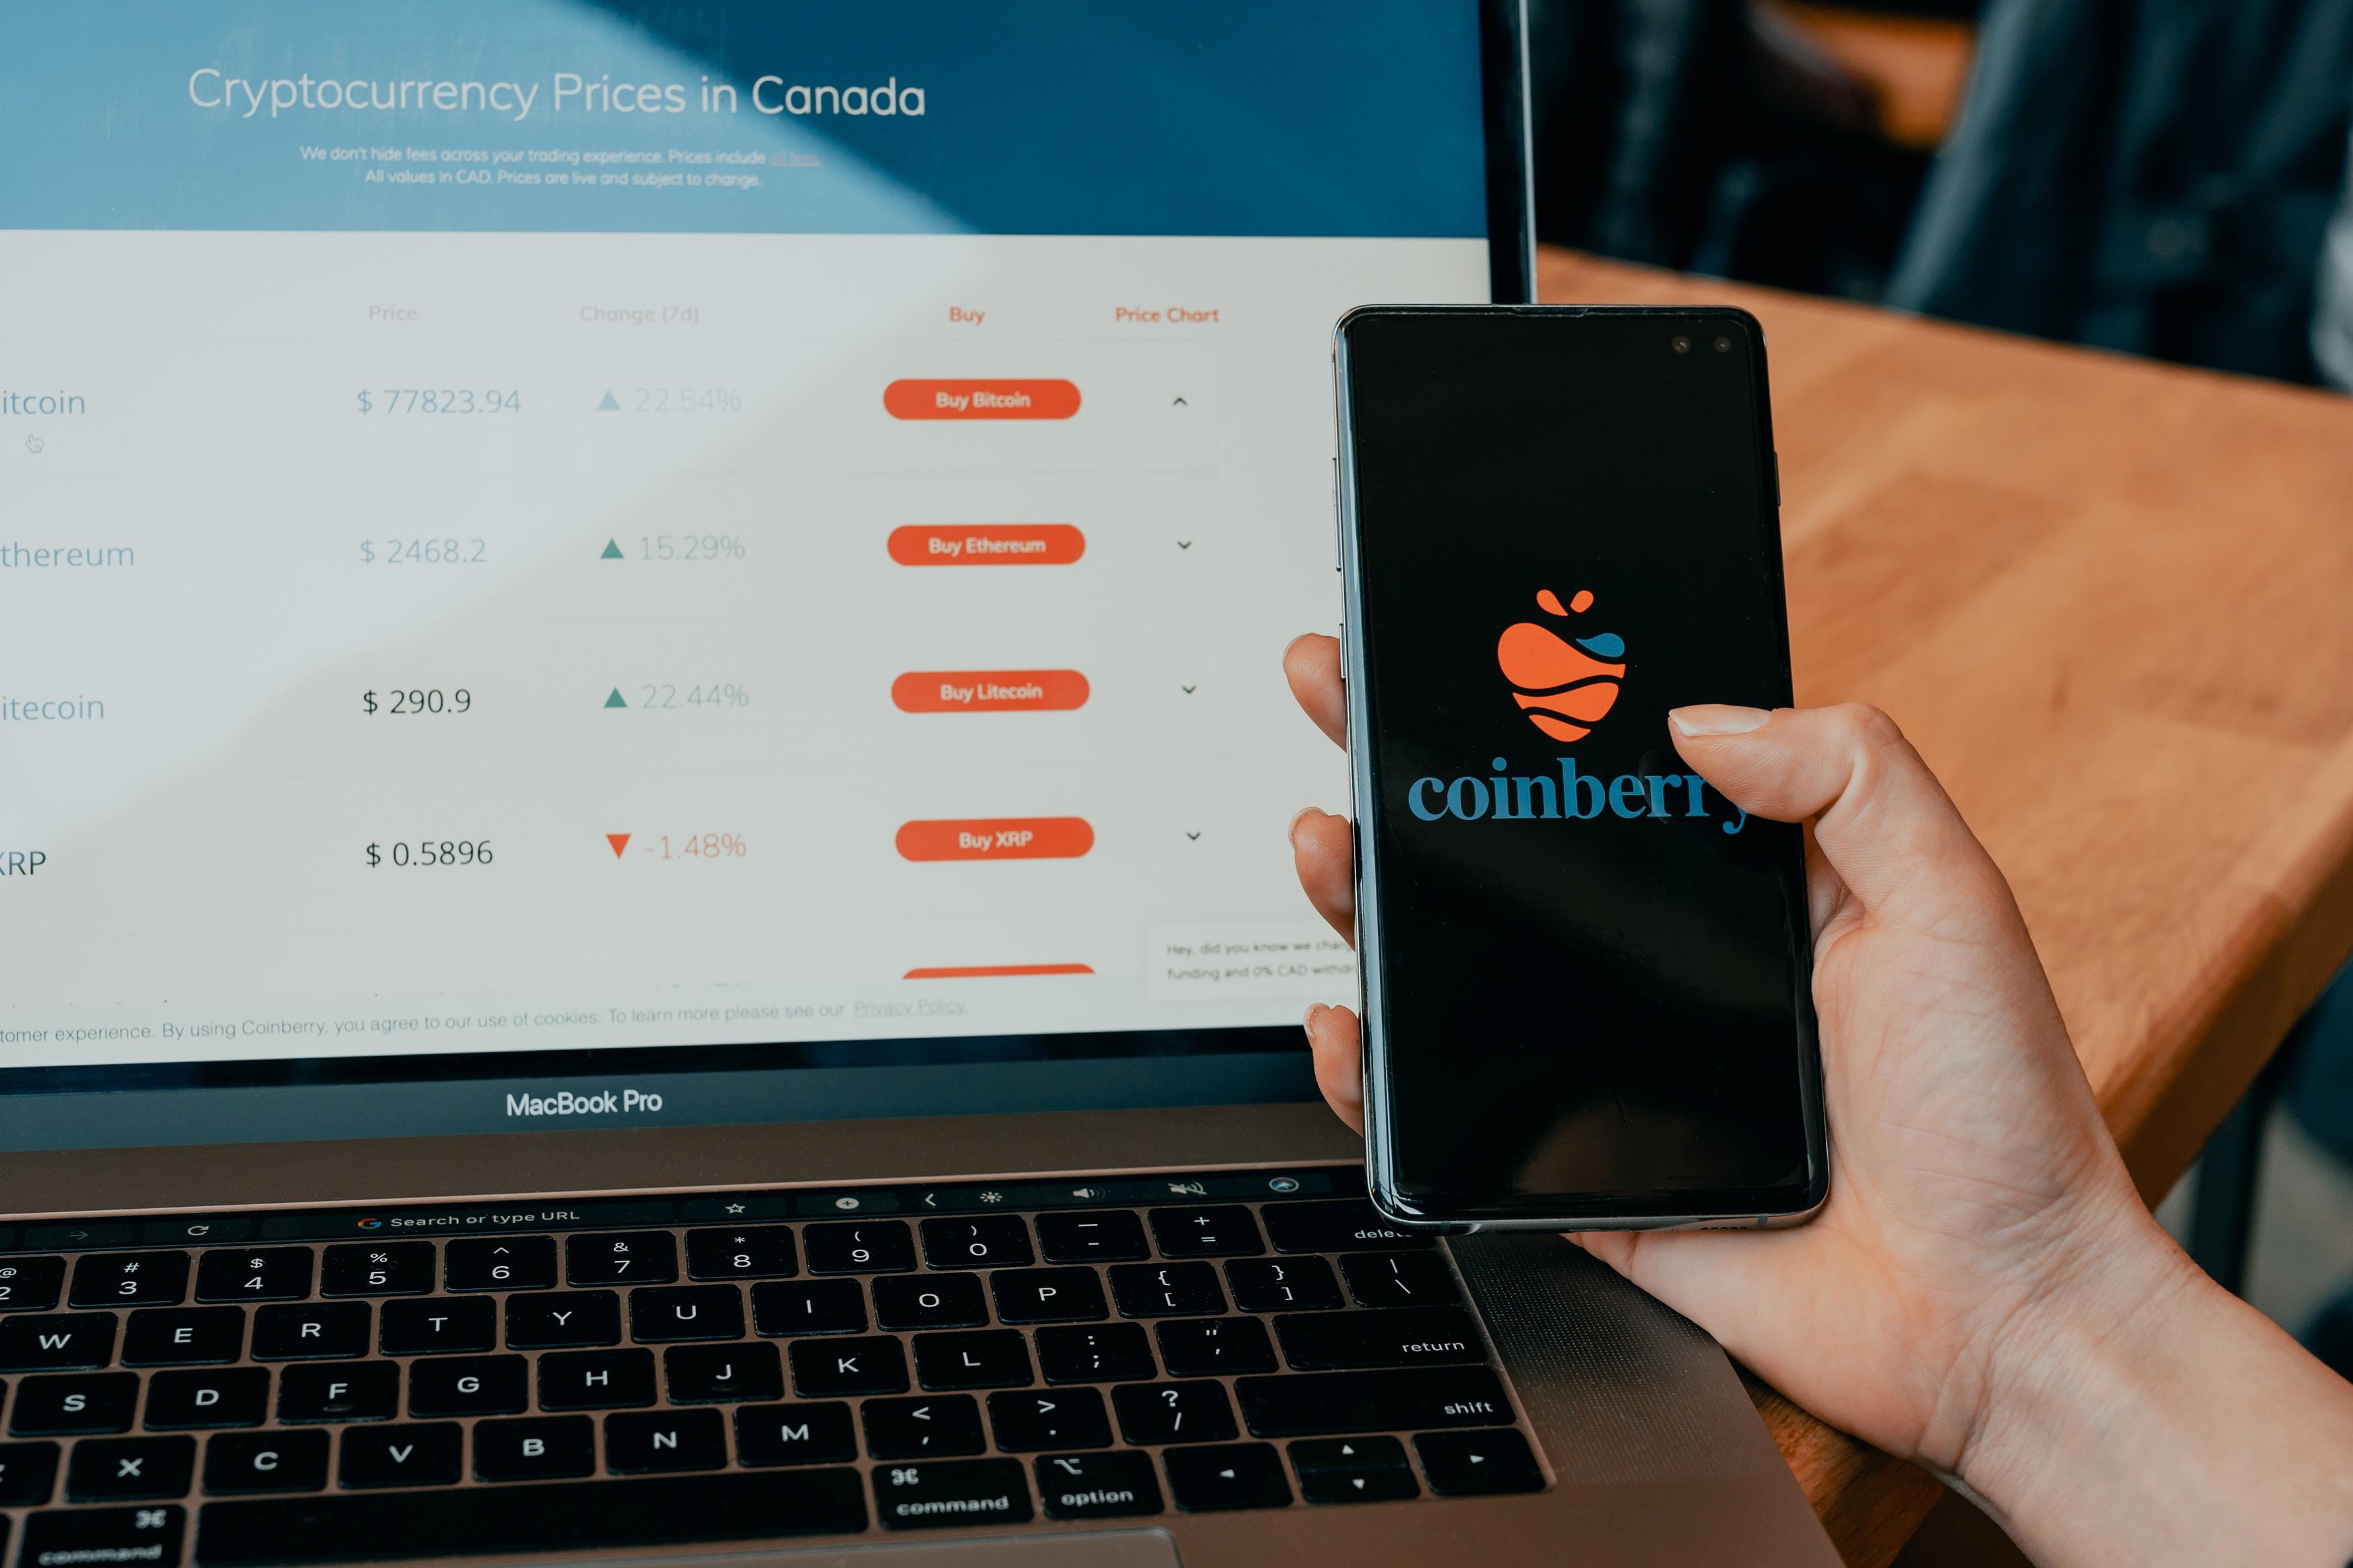 Trading crypto with Coinberry in Canada! Via: techdaily.ca - #crypto #bitcoin #stocks #blockchain #dogecoin